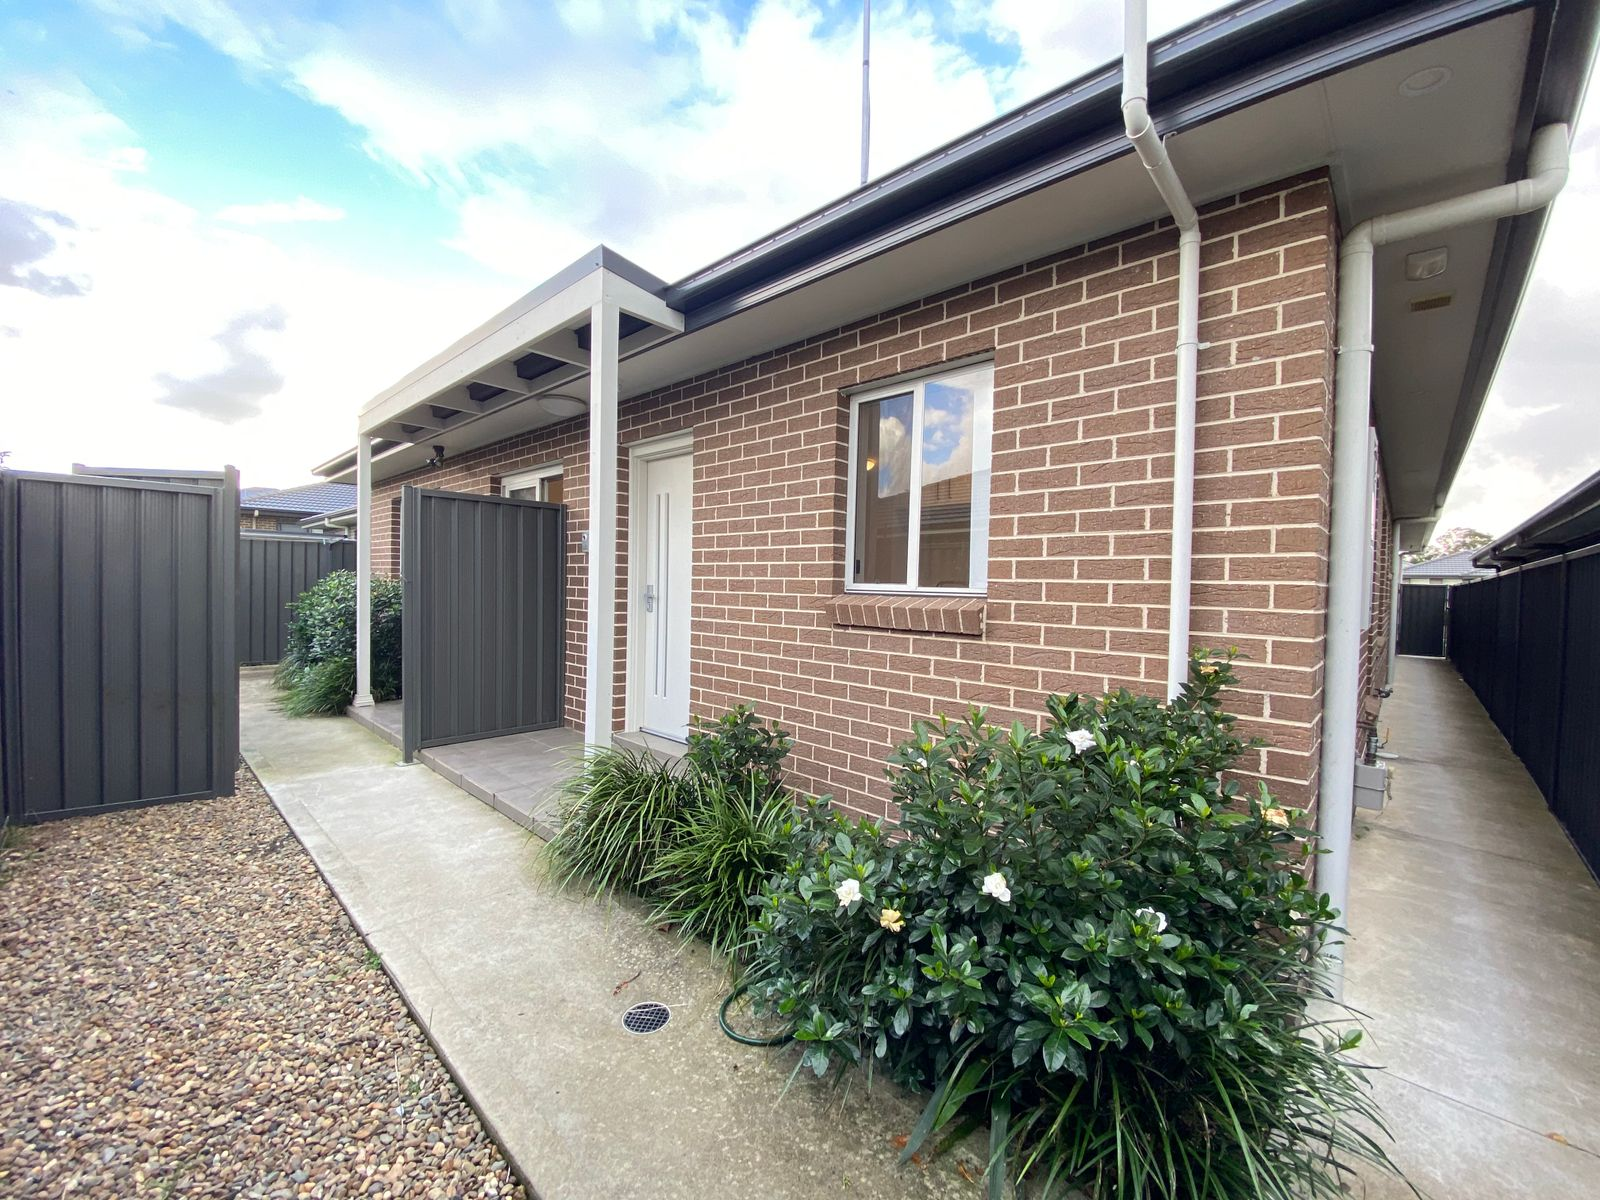 10A Mawer Street, Oran Park, NSW 2570